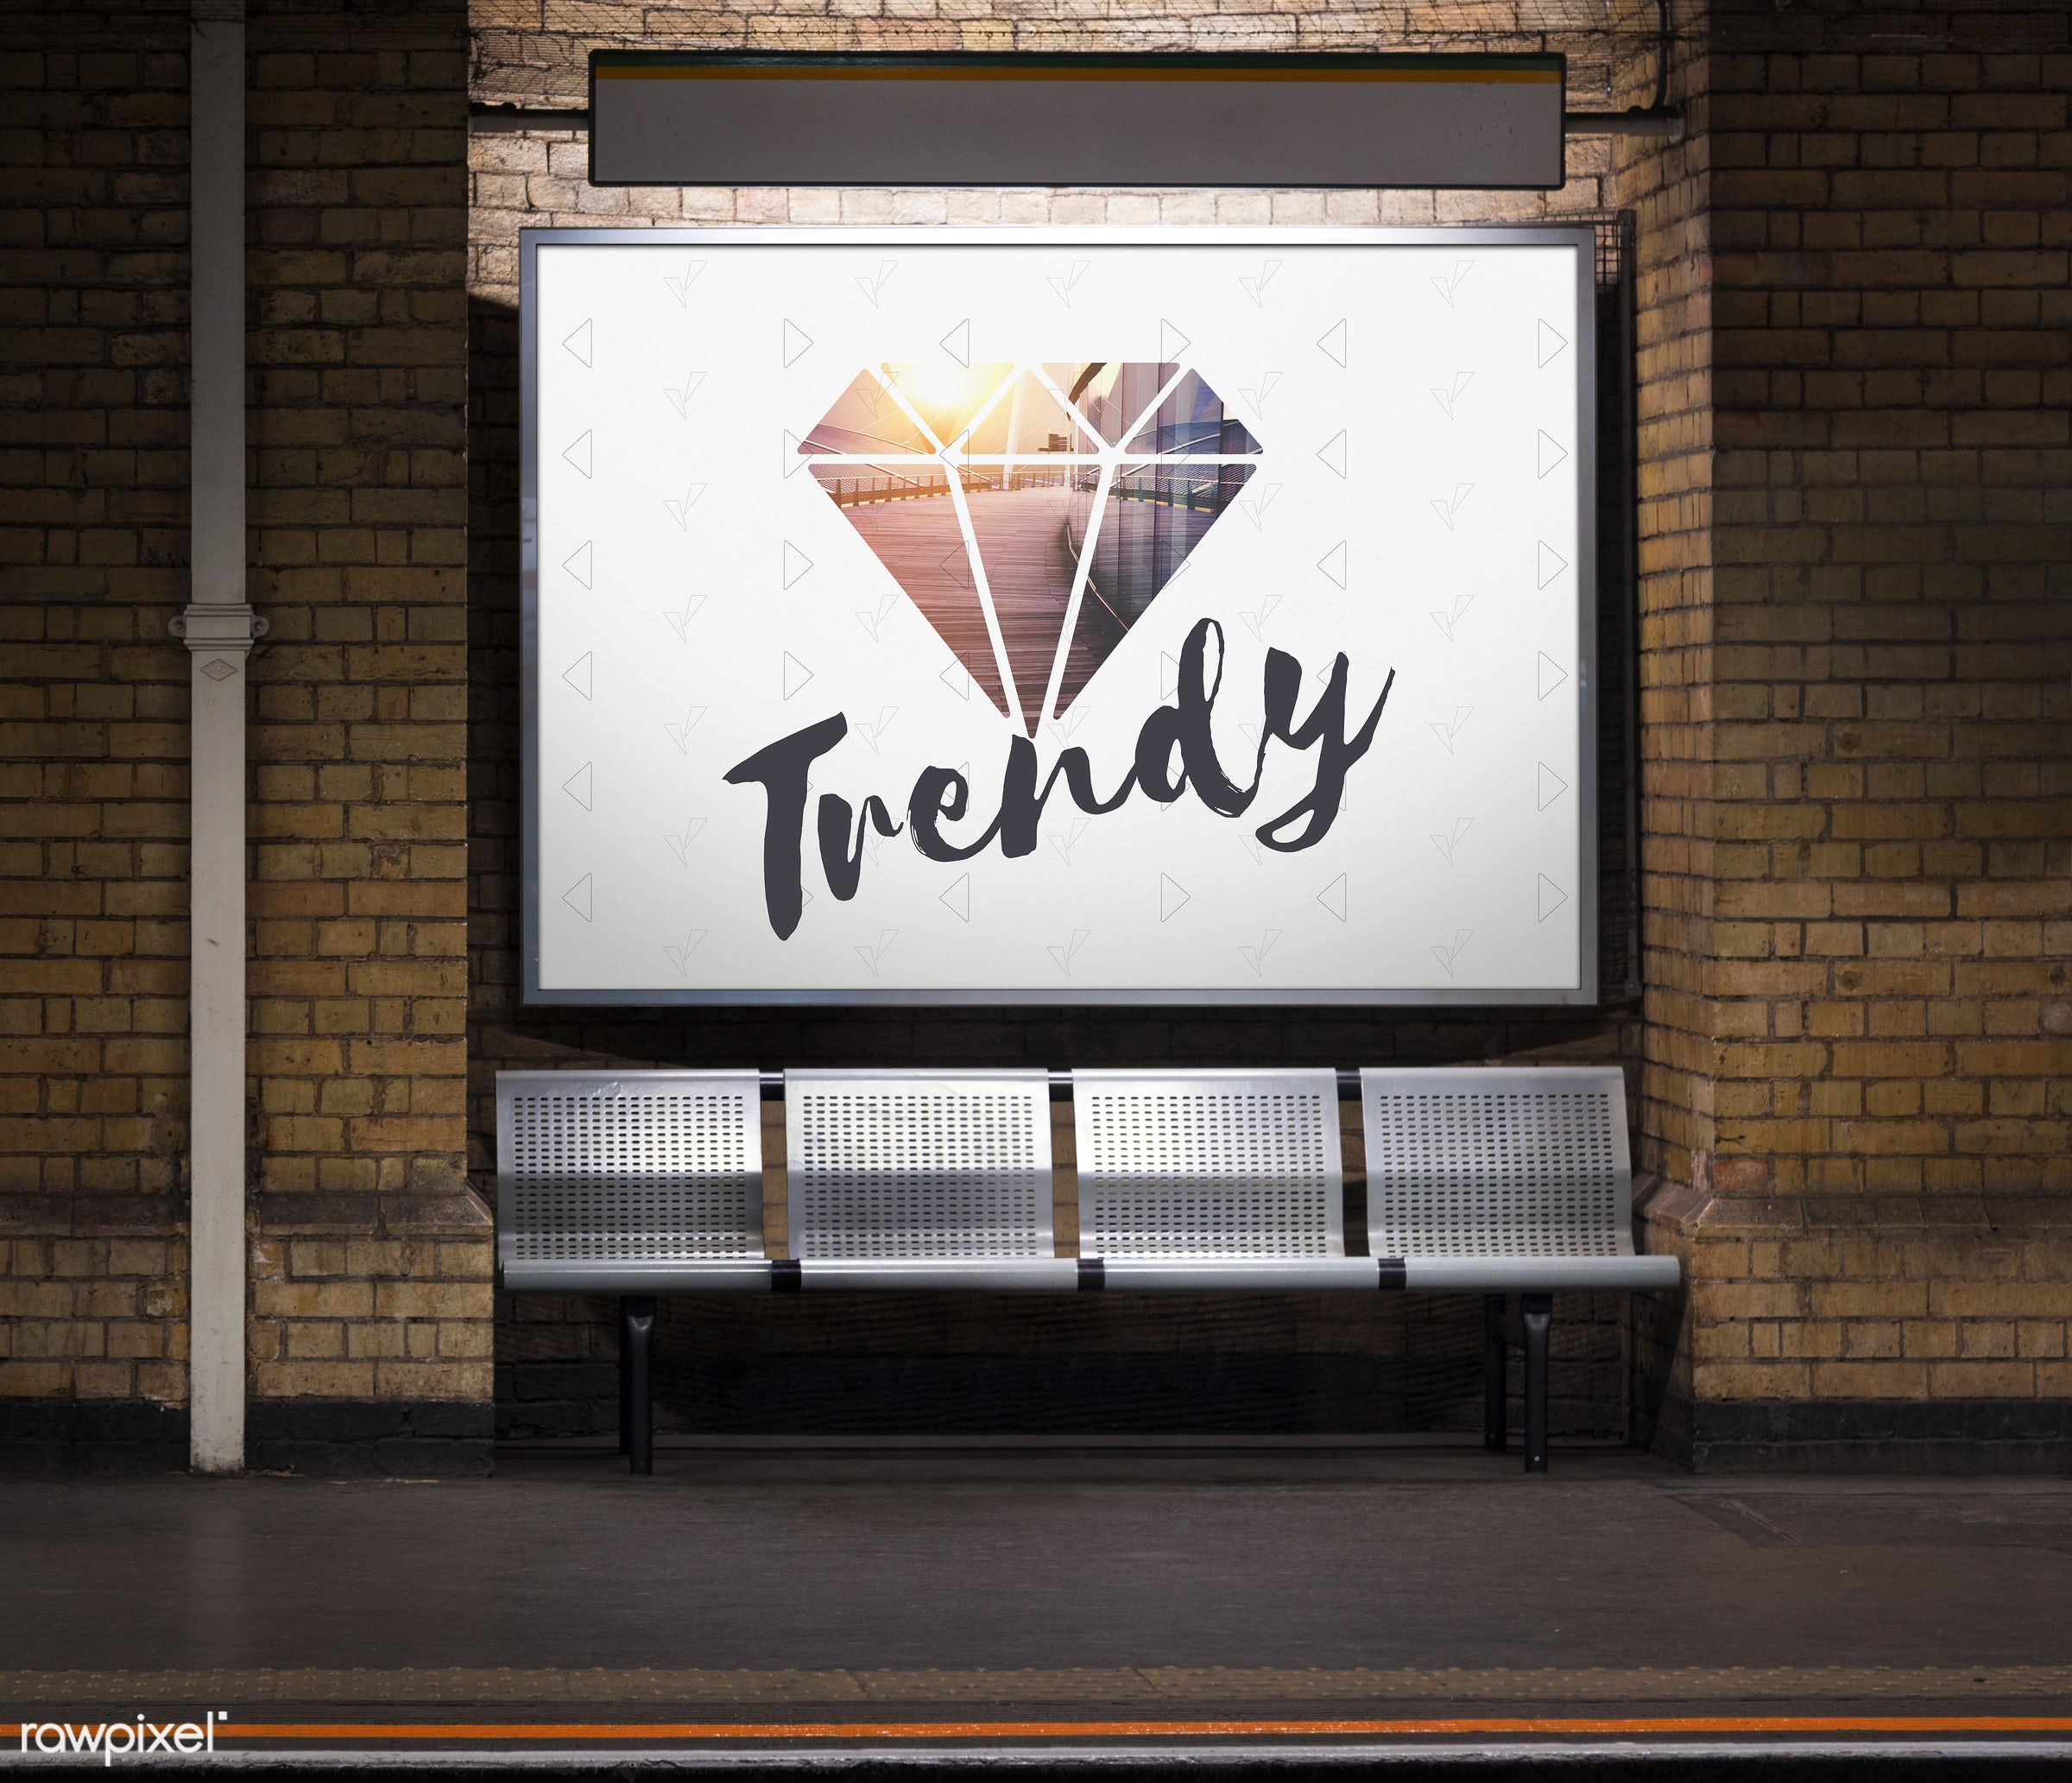 art, bricks, brickswall, business, creative, design, diamond, edit, fashion, forecast, hot, latest, market, marketing,...